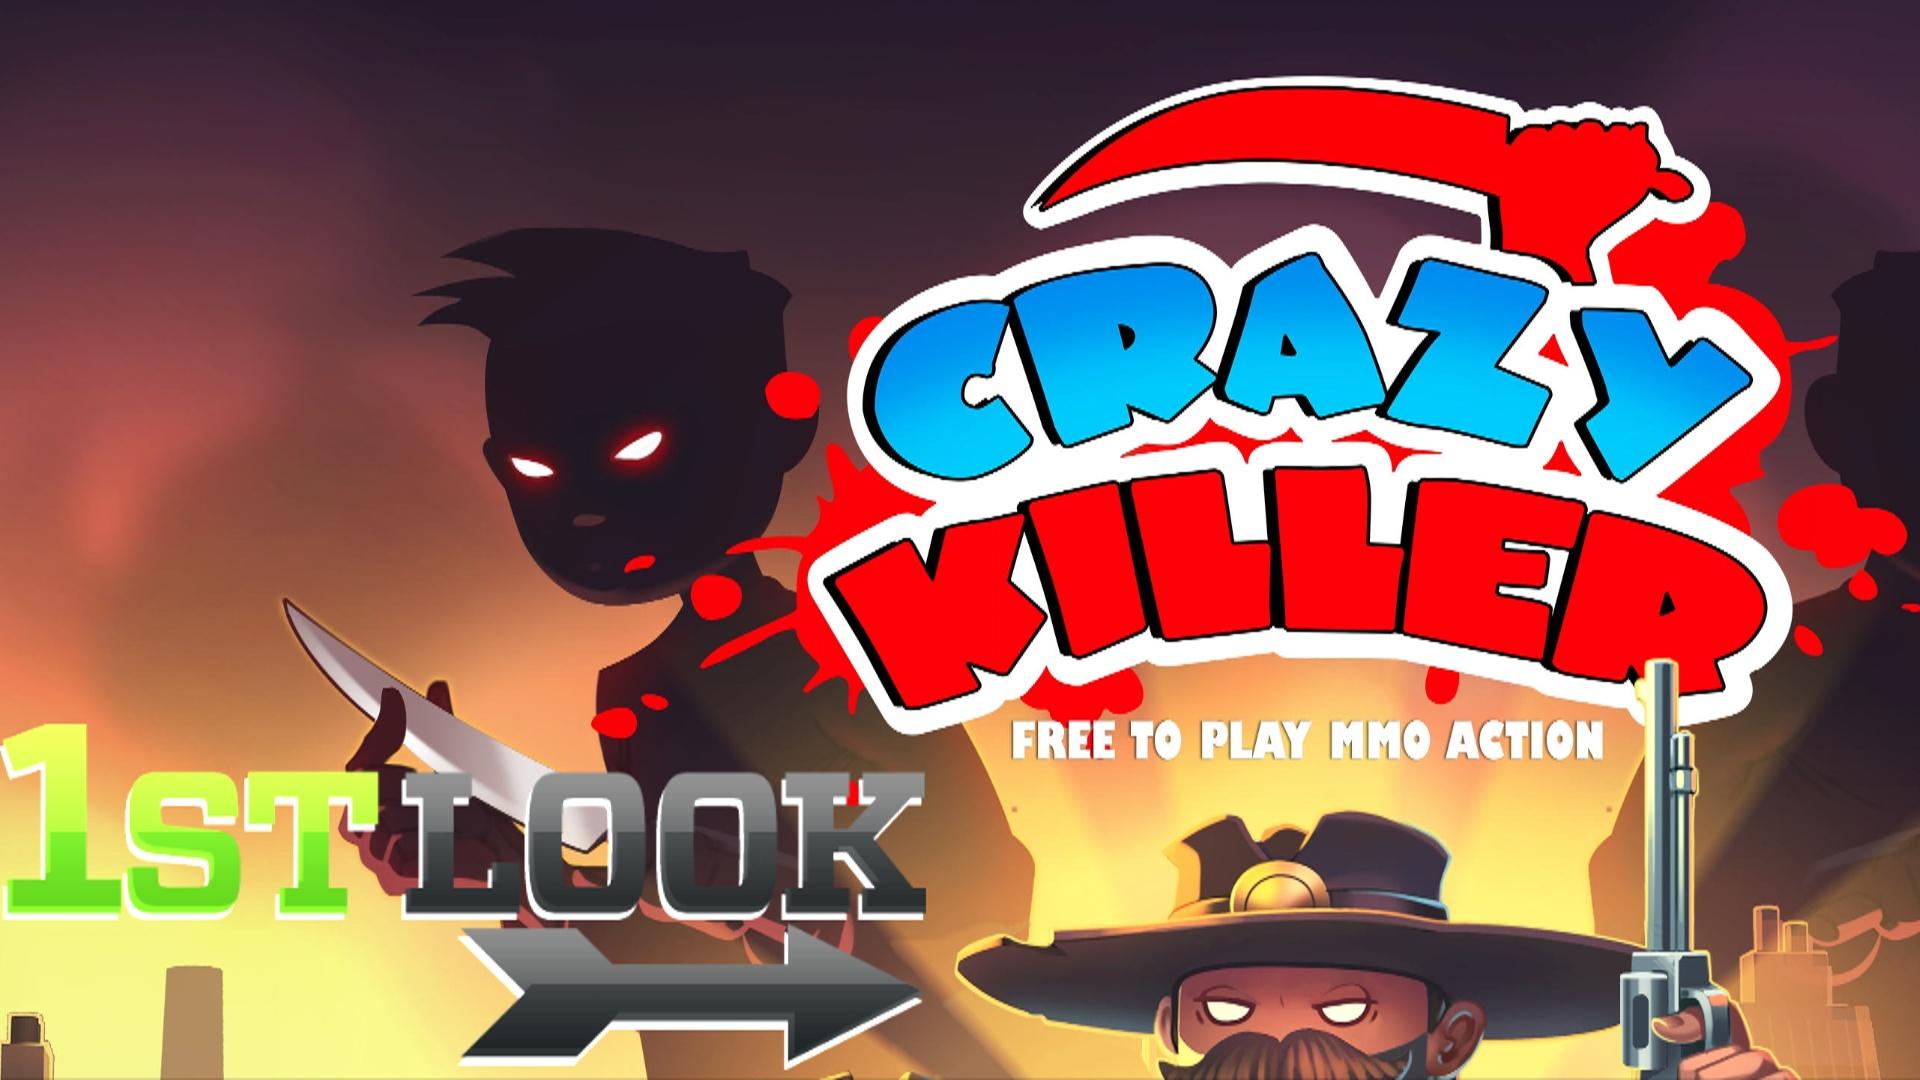 Crazy Killer First Look